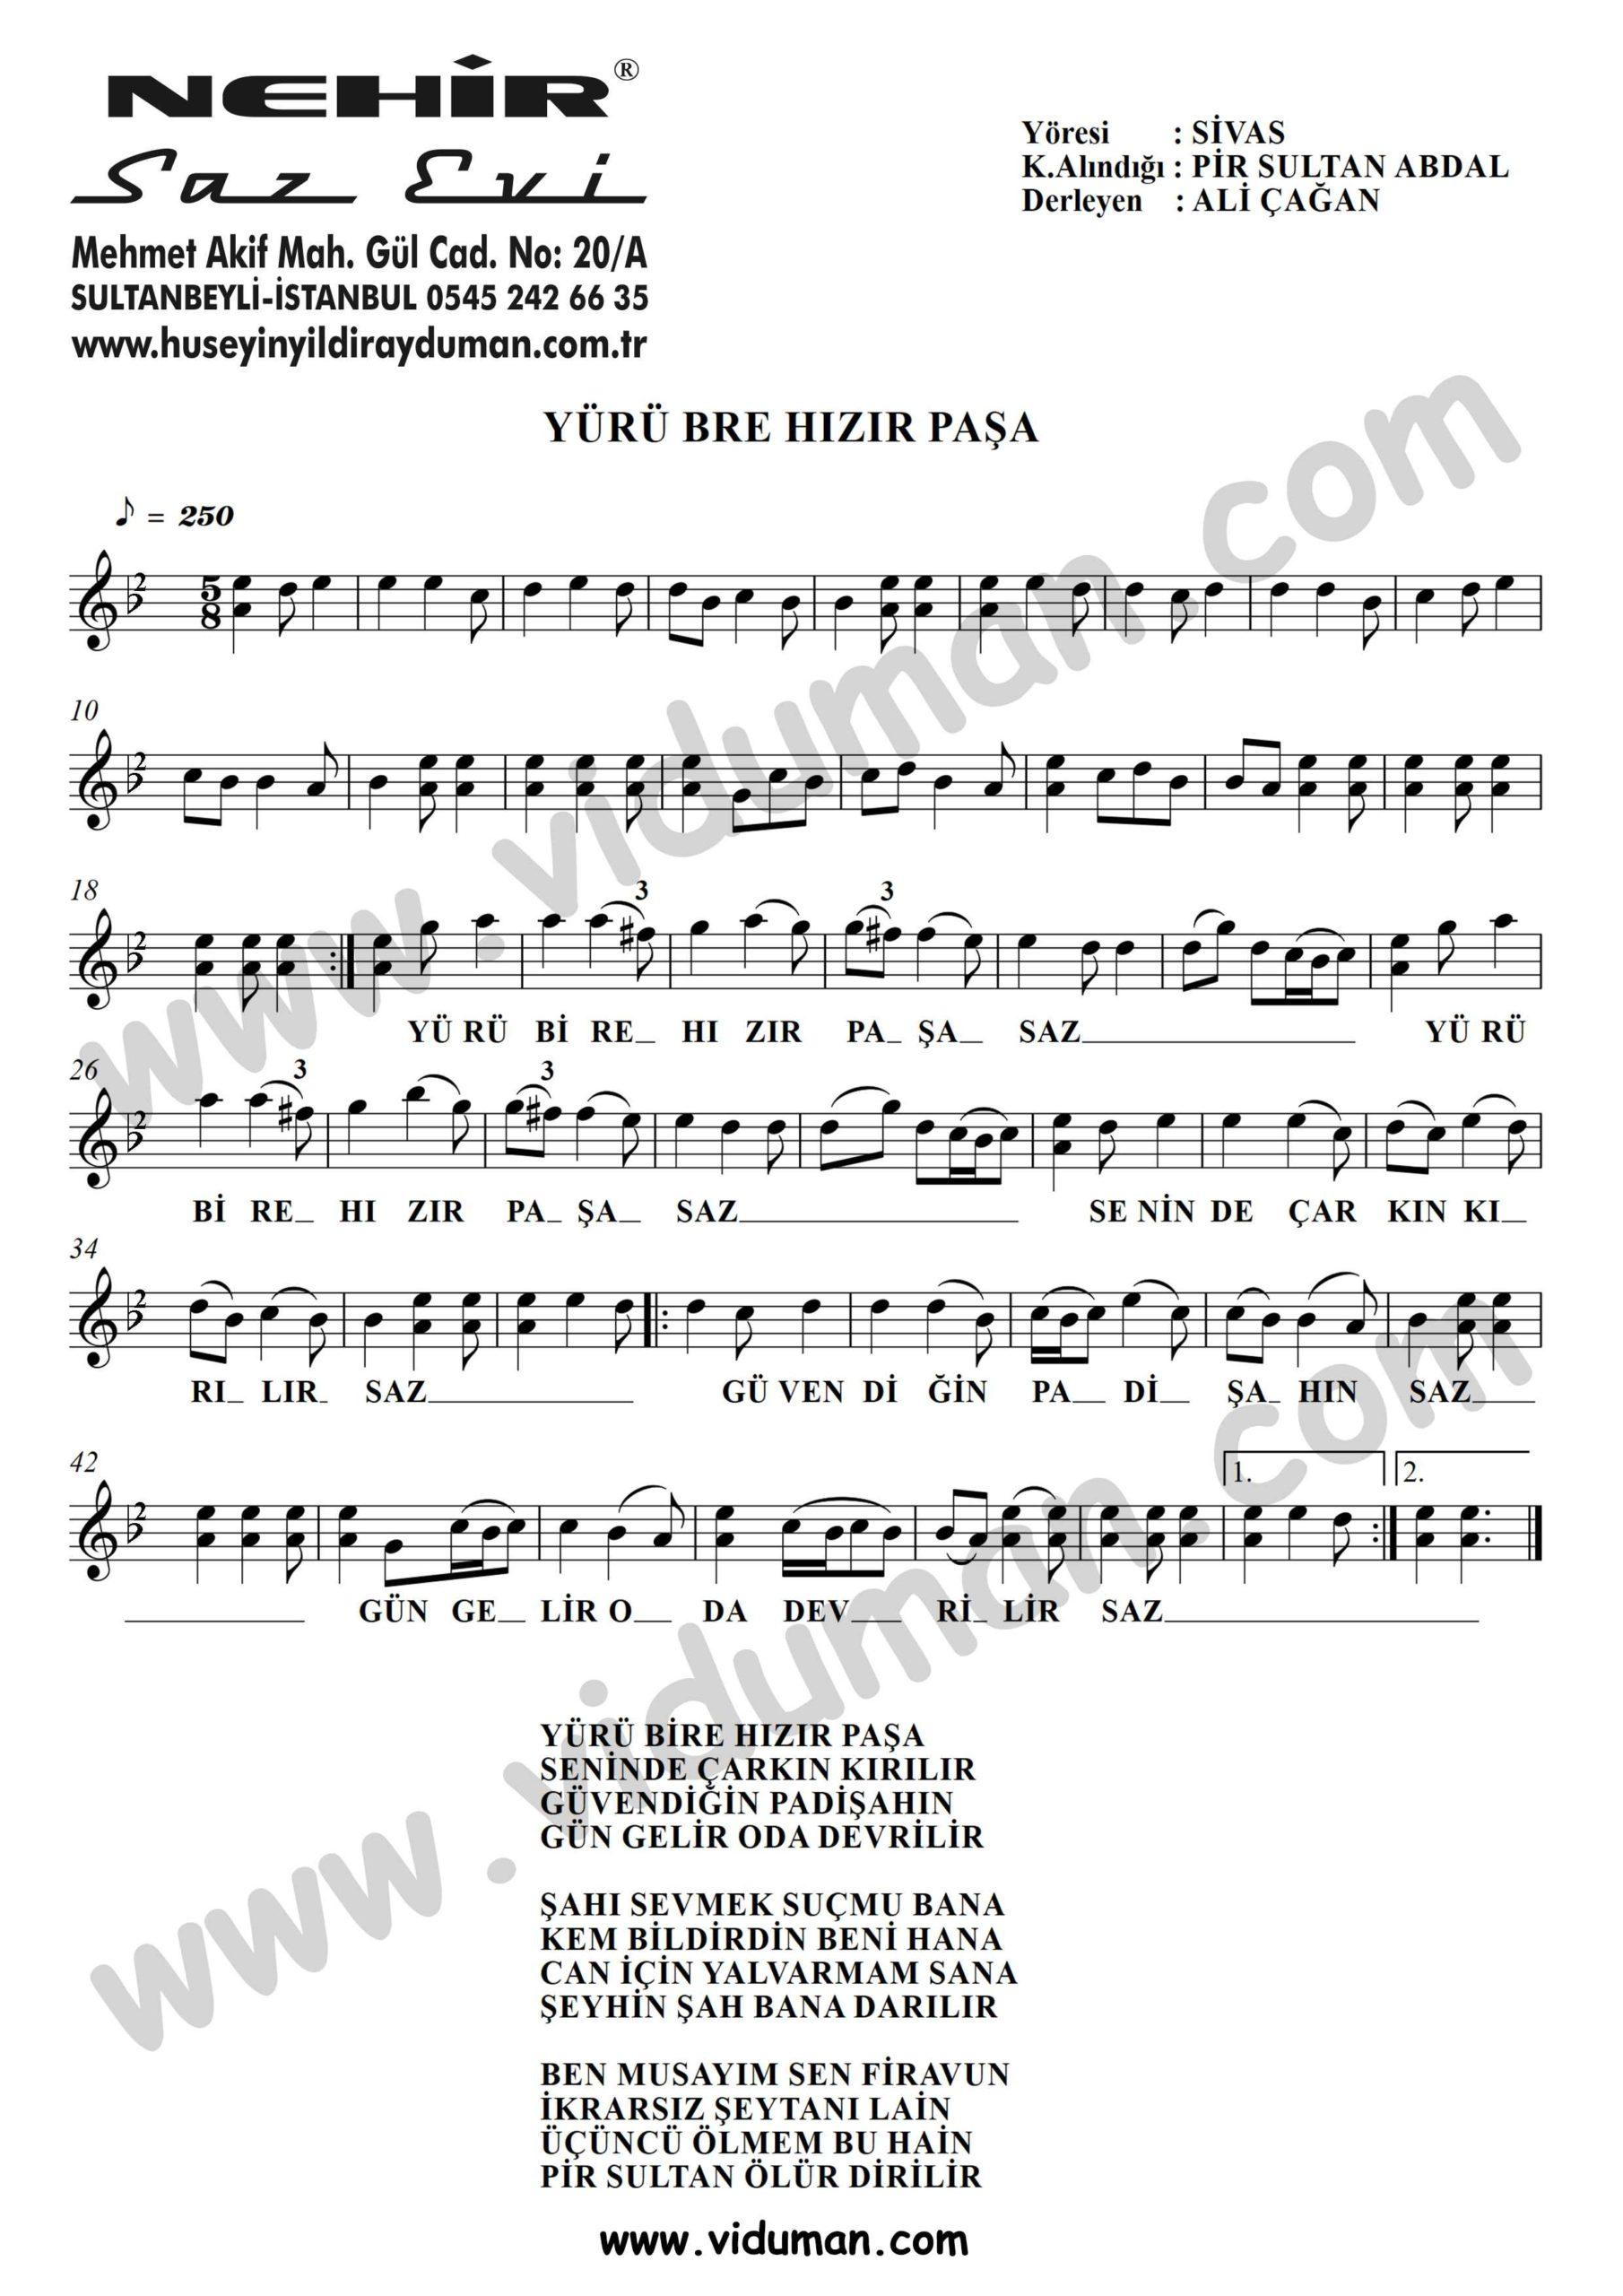 Yuru Bre Hizir Pasa-Baglama-Saz-Turku-Notalari